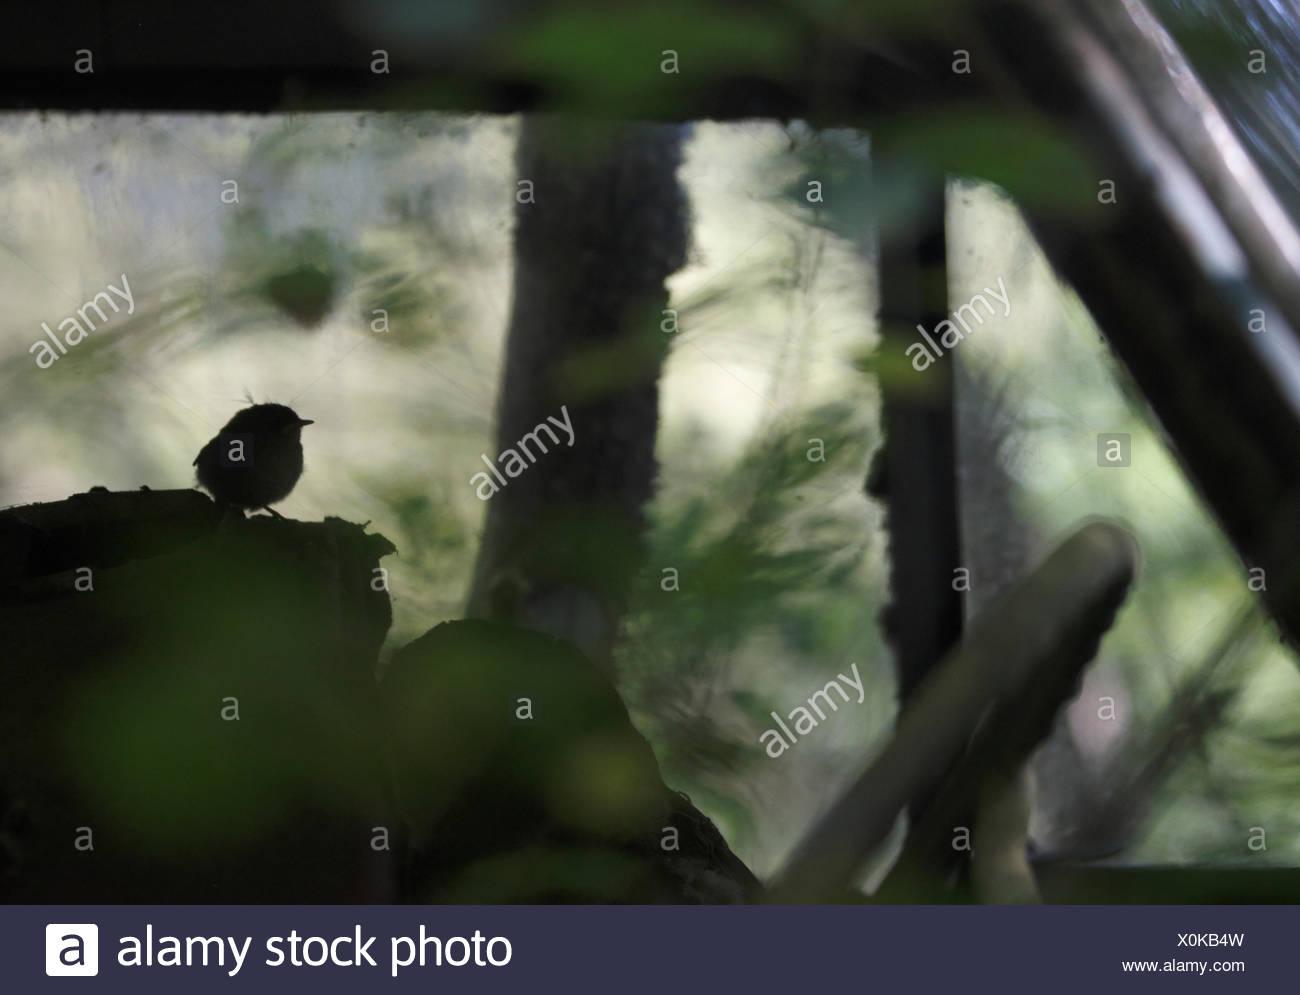 Young wren (Troglodytes troglodytes) in an old abandoned car in 'car graveyard' Bastnas Sweden - Stock Image